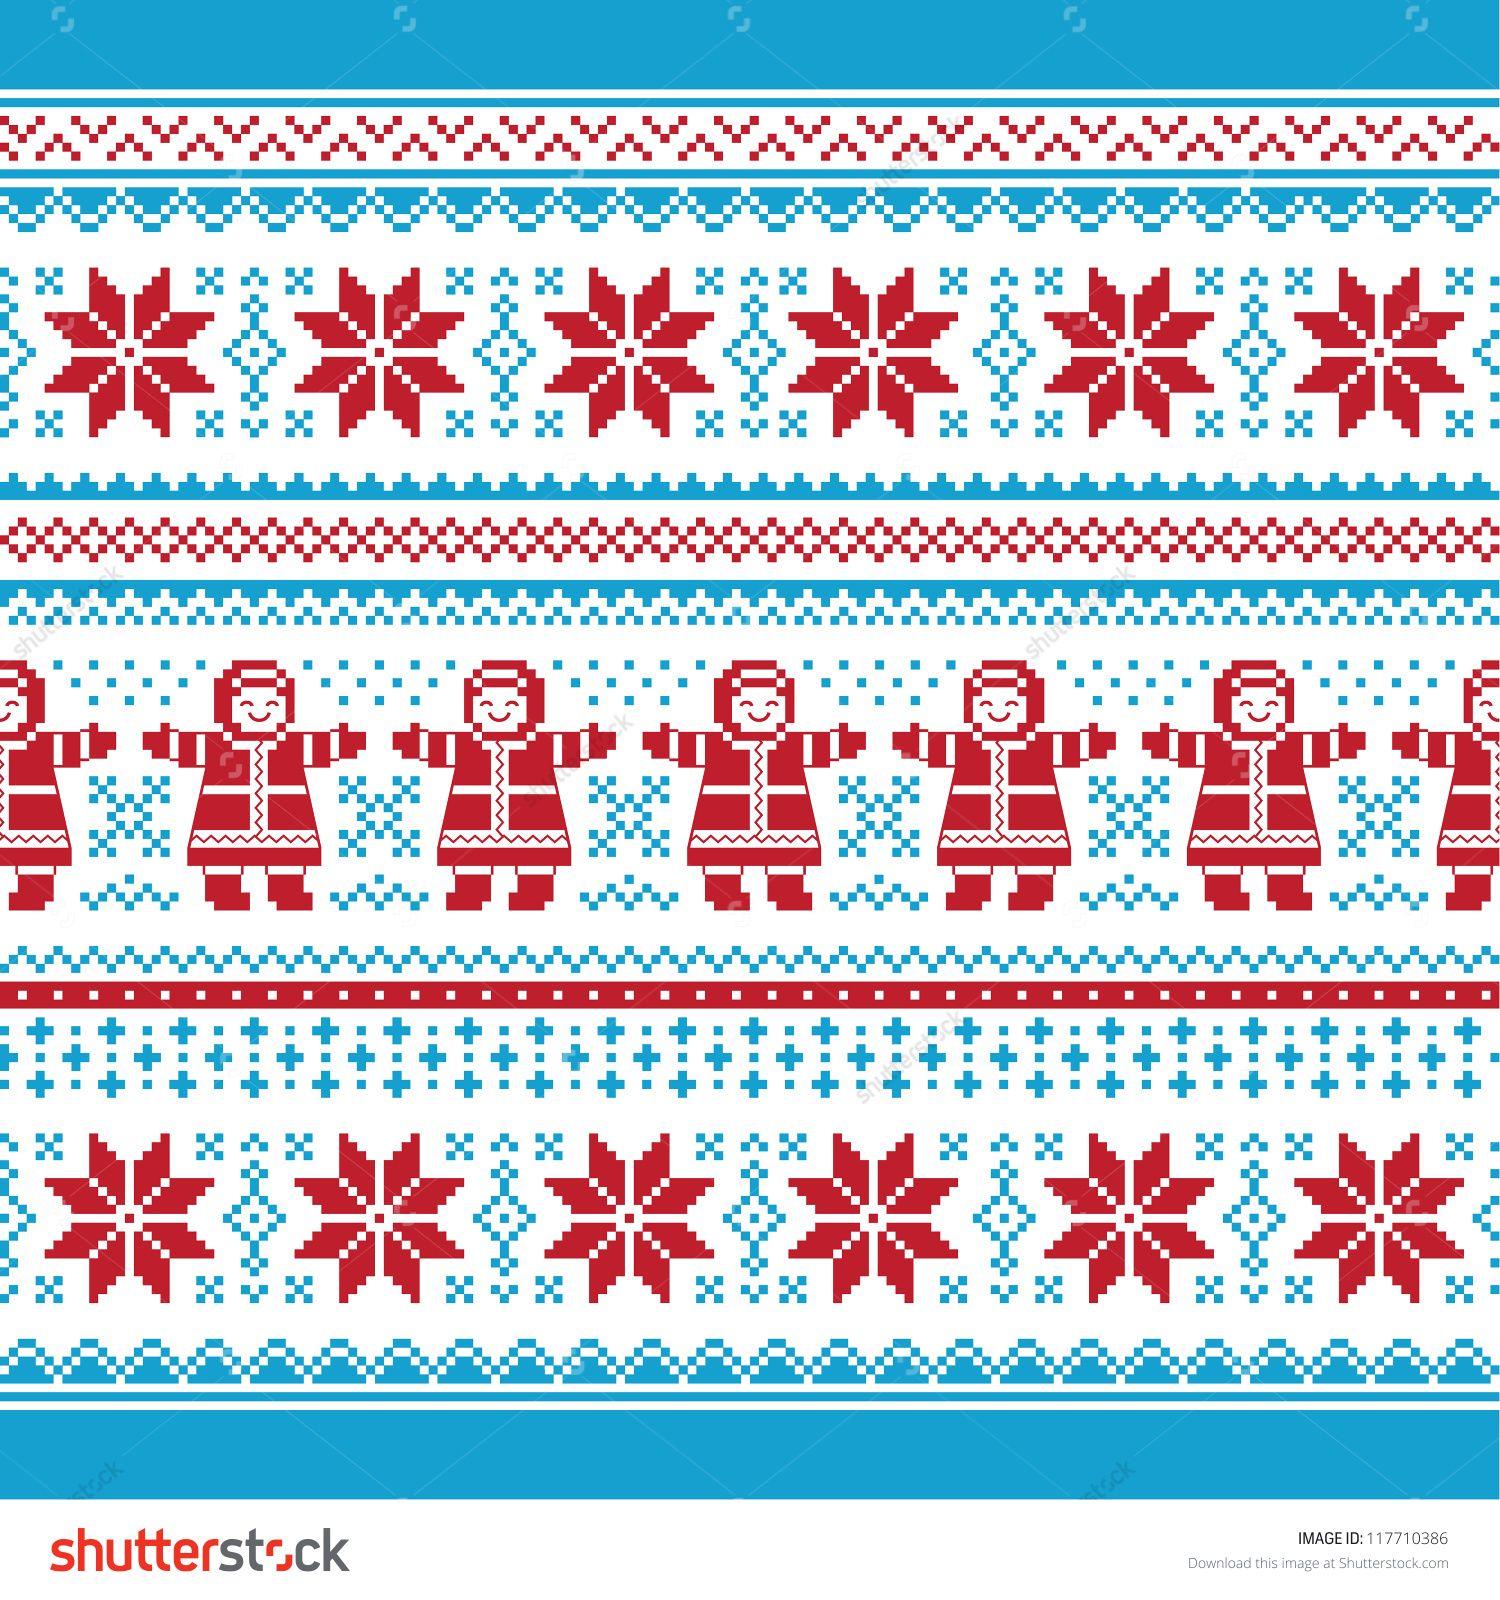 Pin von Megan Lewis auf CELEBRATION: Christmas | Pinterest | Leggins ...